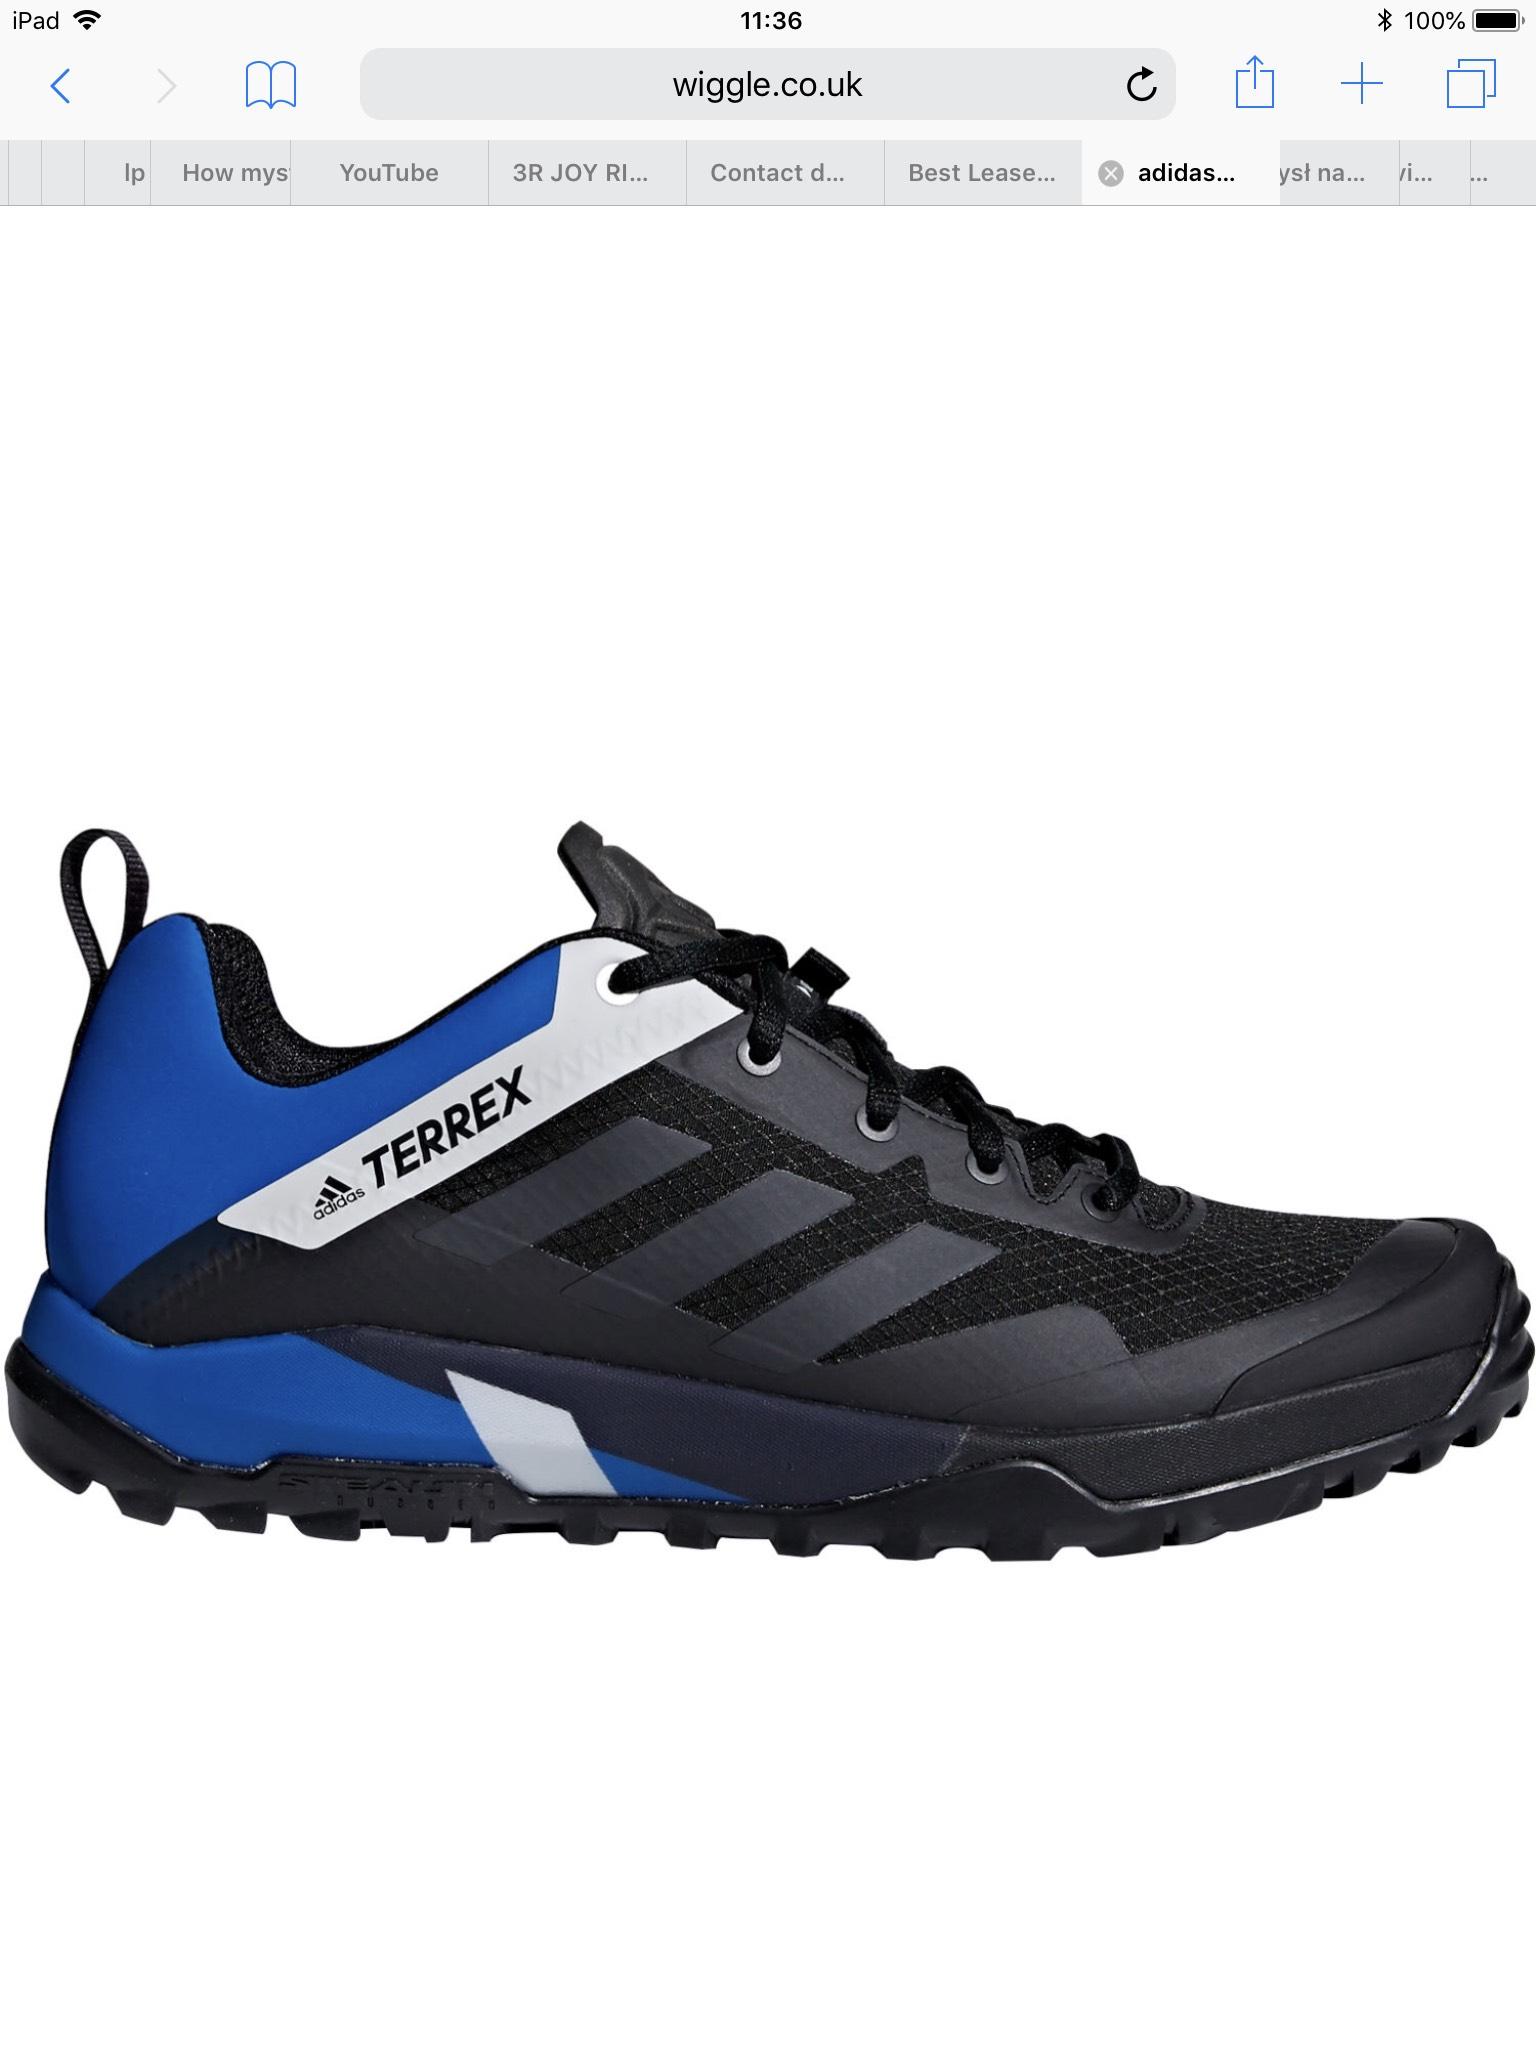 Adidas Terrex Trail Cross SL Shoes £69.90  Wiggle